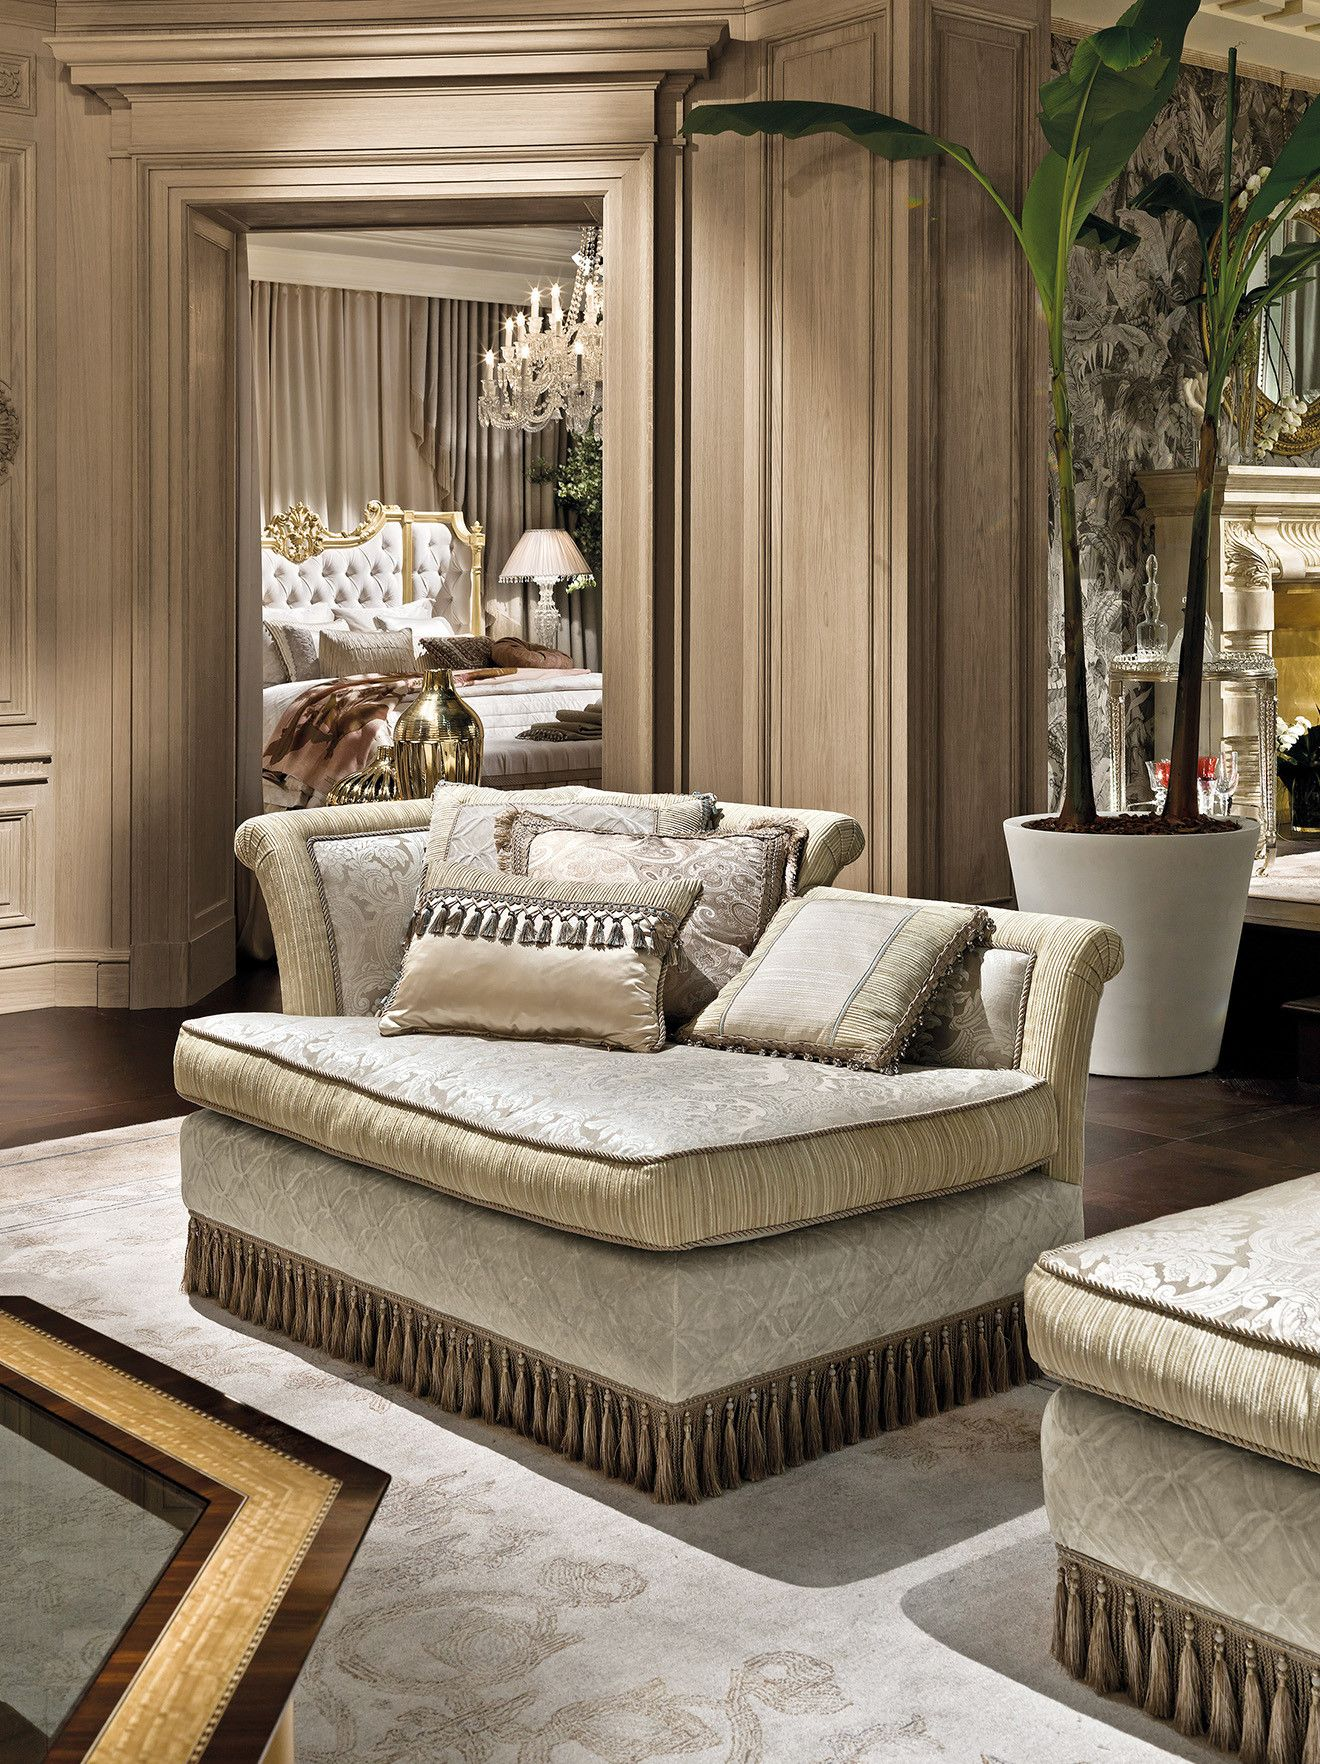 italian furniture designs. Traditional Luxury Italian Furniture From Provasi - The Beautiful Designs Of Provasi, Combining E